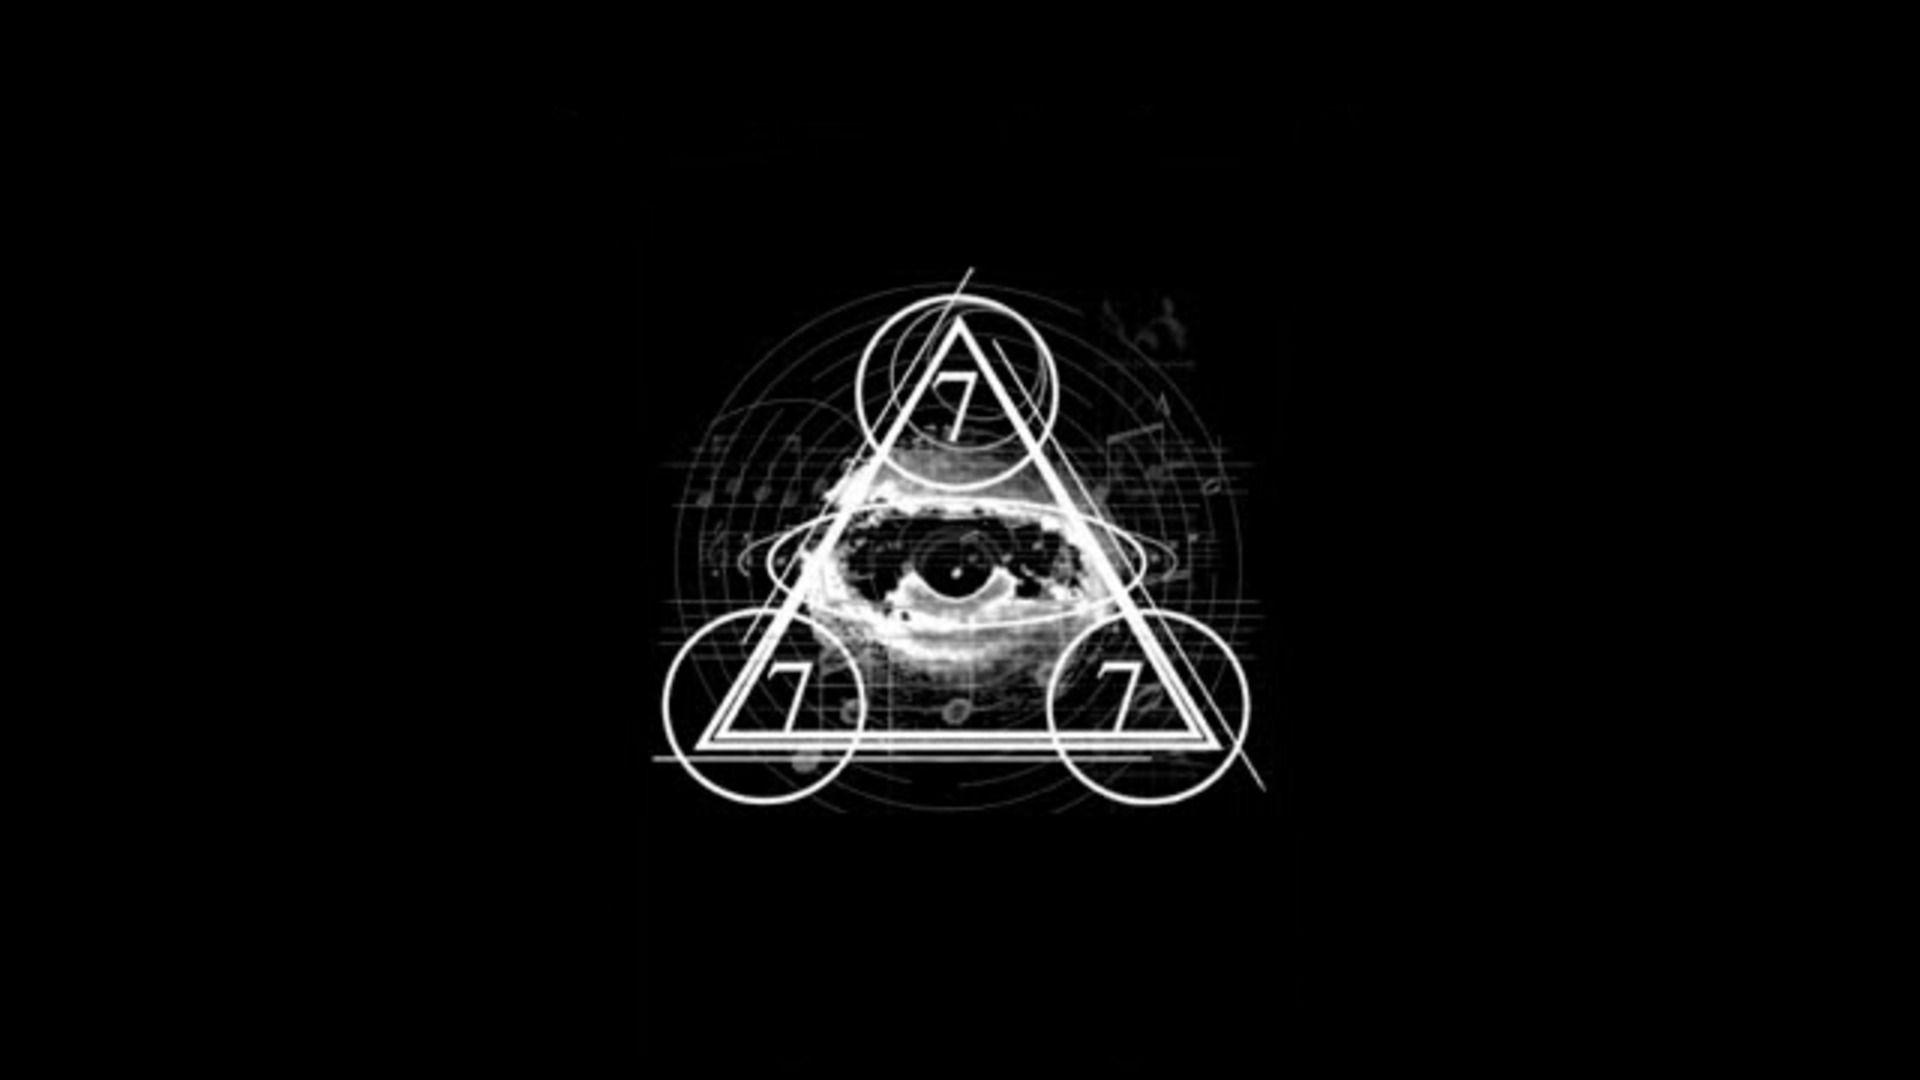 Freemason wallpaper image hd